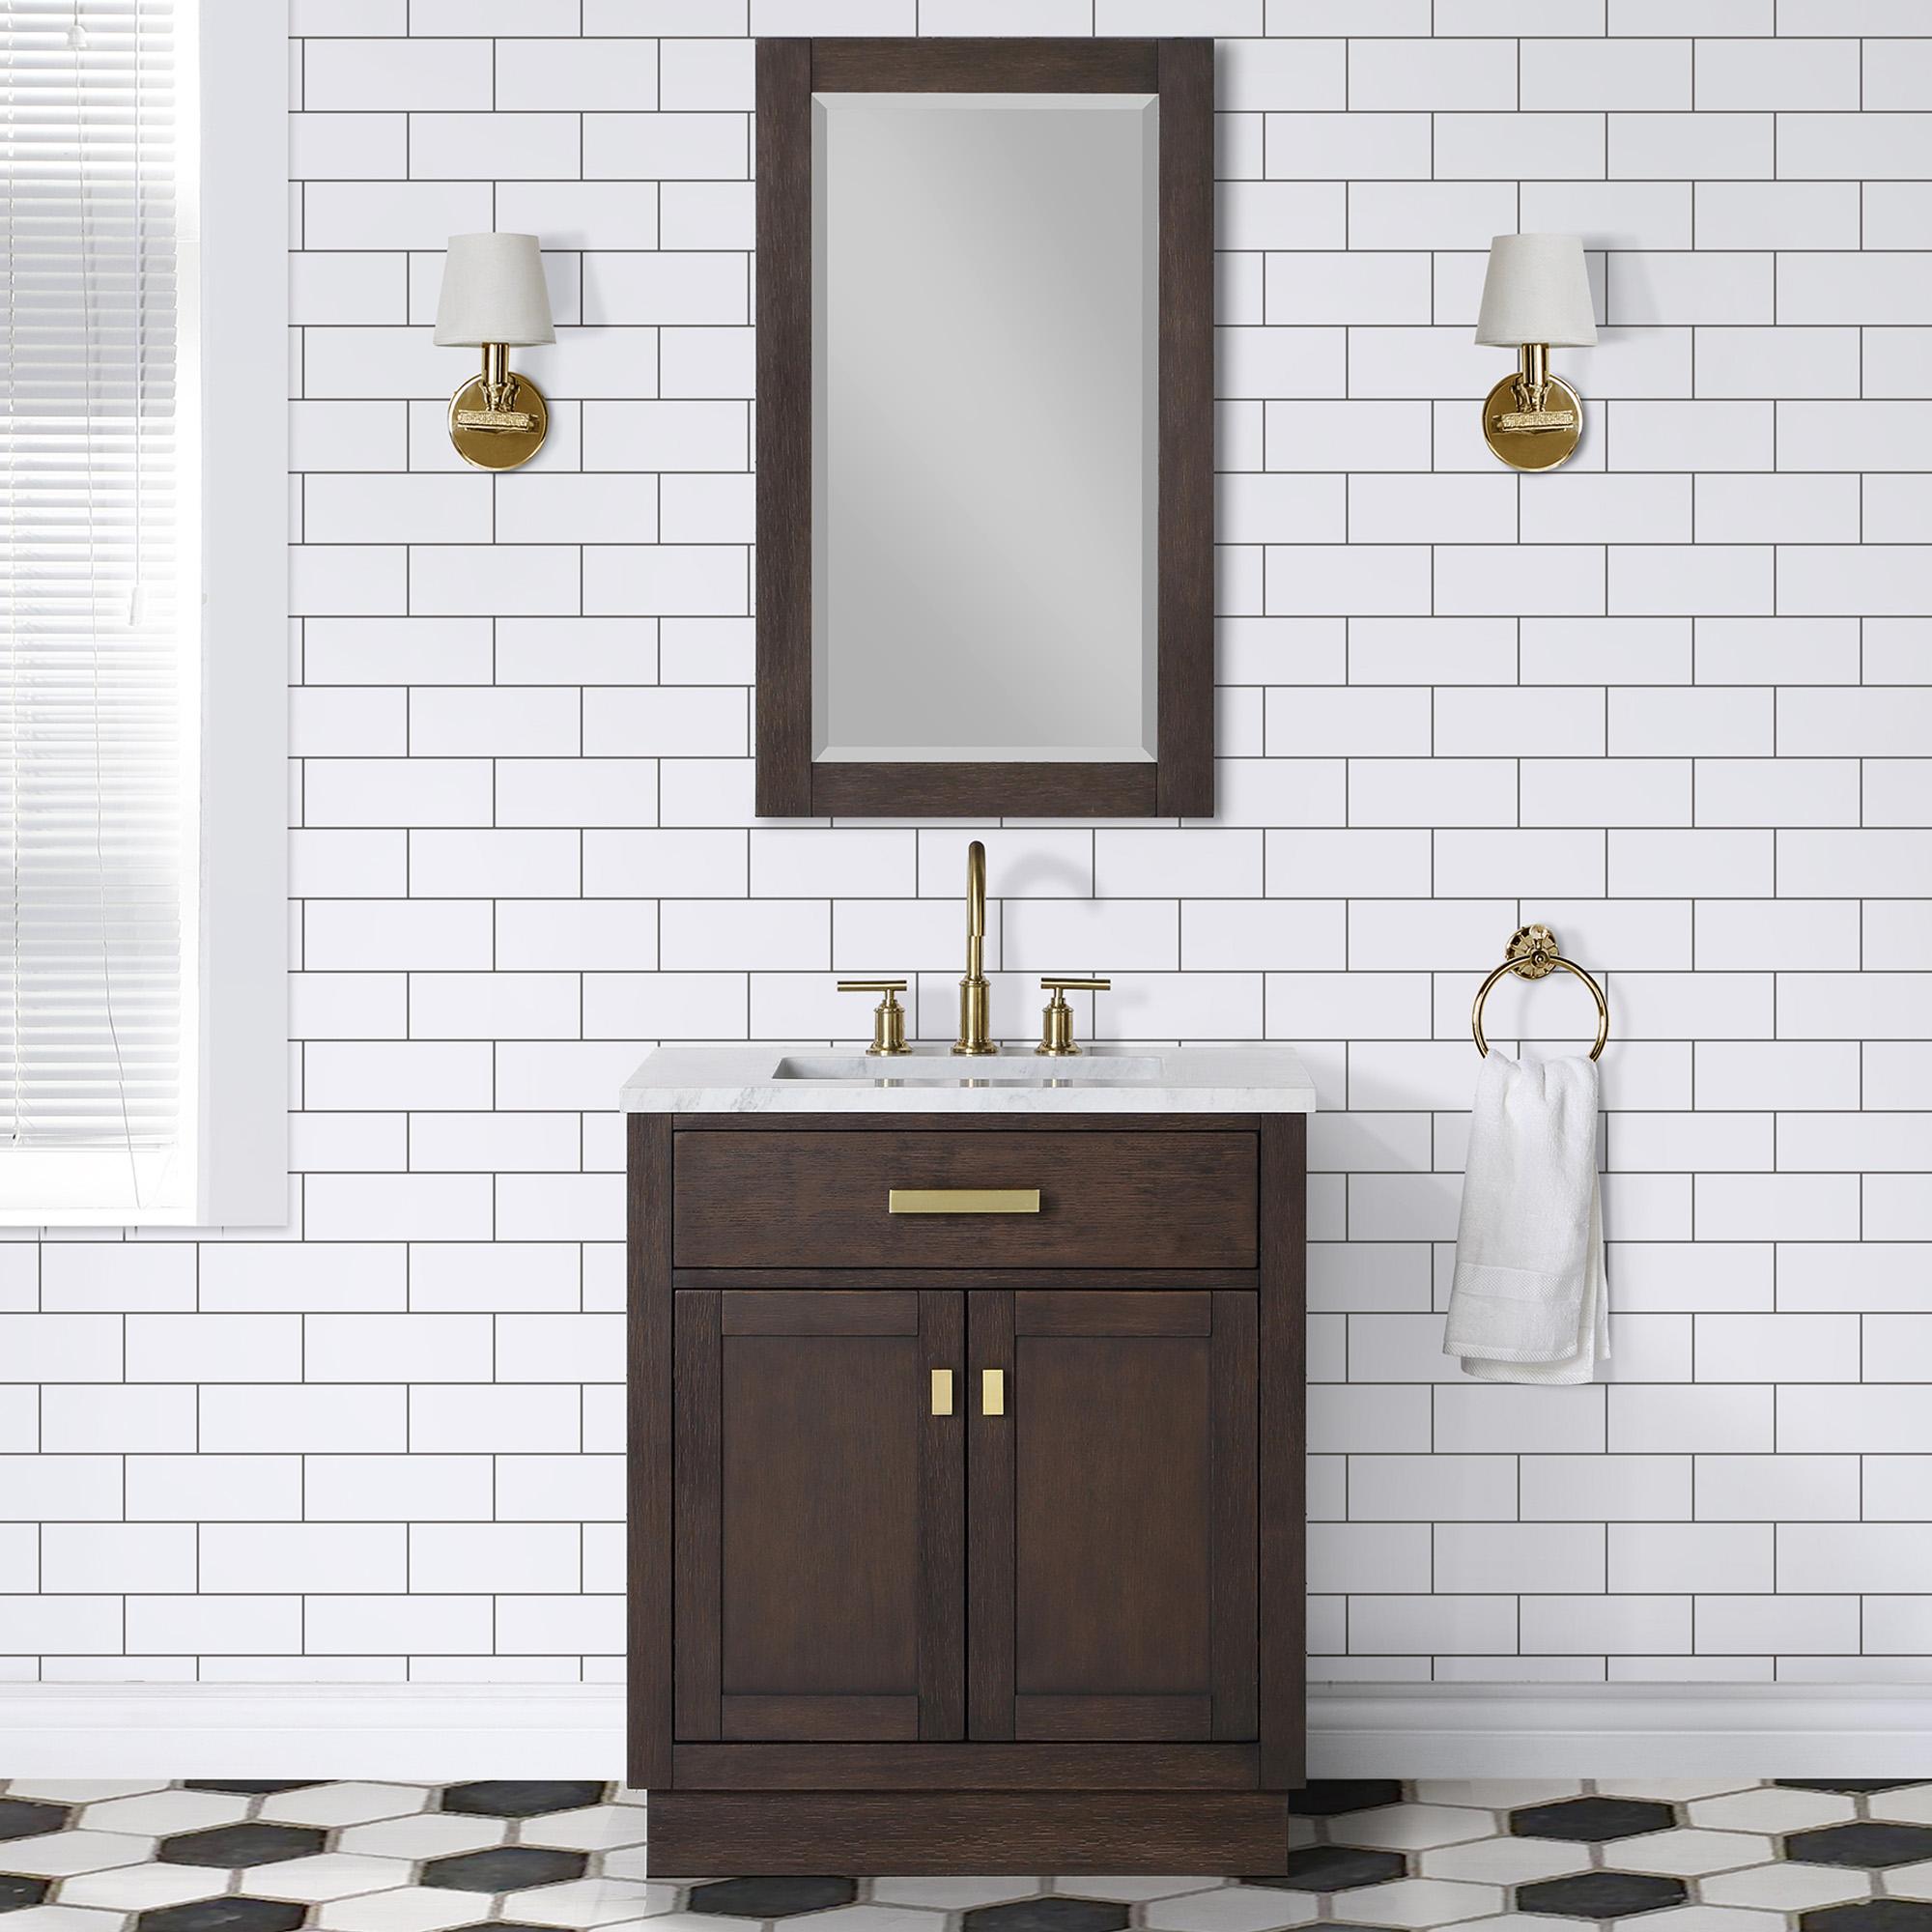 "30"" Brown Oak Single Bathroom Vanity with Seamless Italian Carrara White Marble Top"